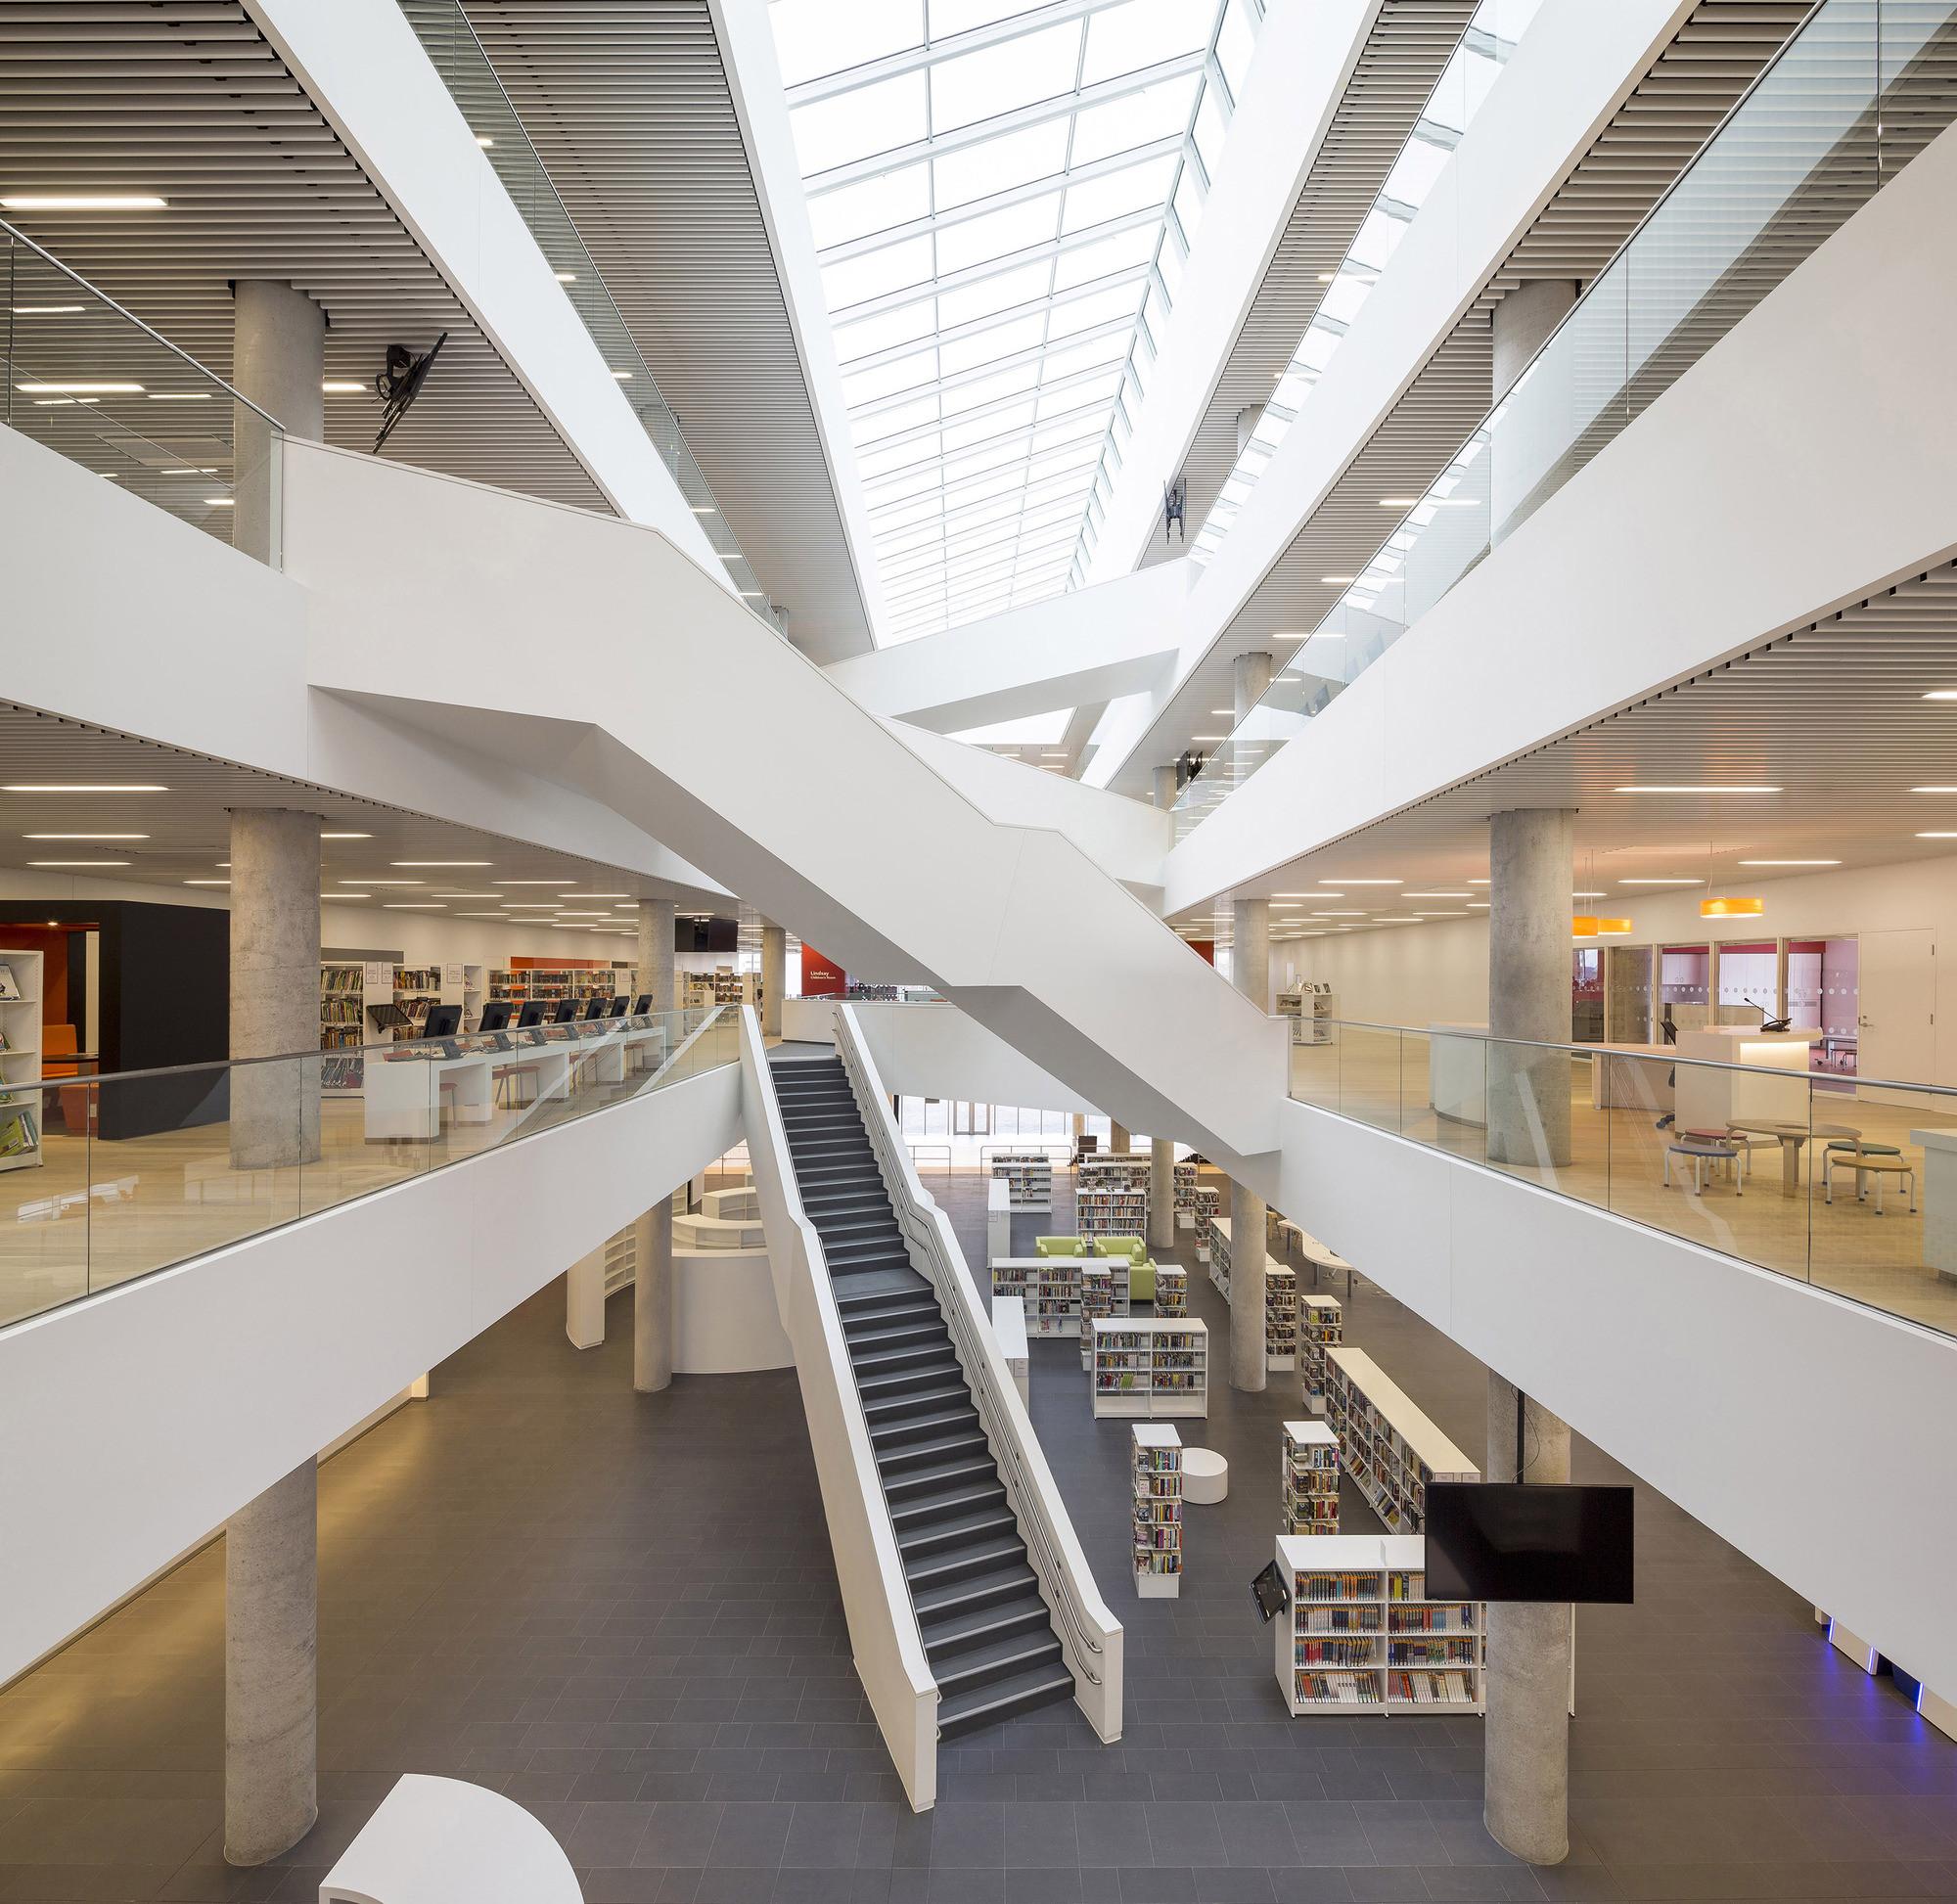 New Halifax Central Library / Schmidt Hammer Lassen + Fowler Bauld & Mitchell. Imagen © Adam Mørk